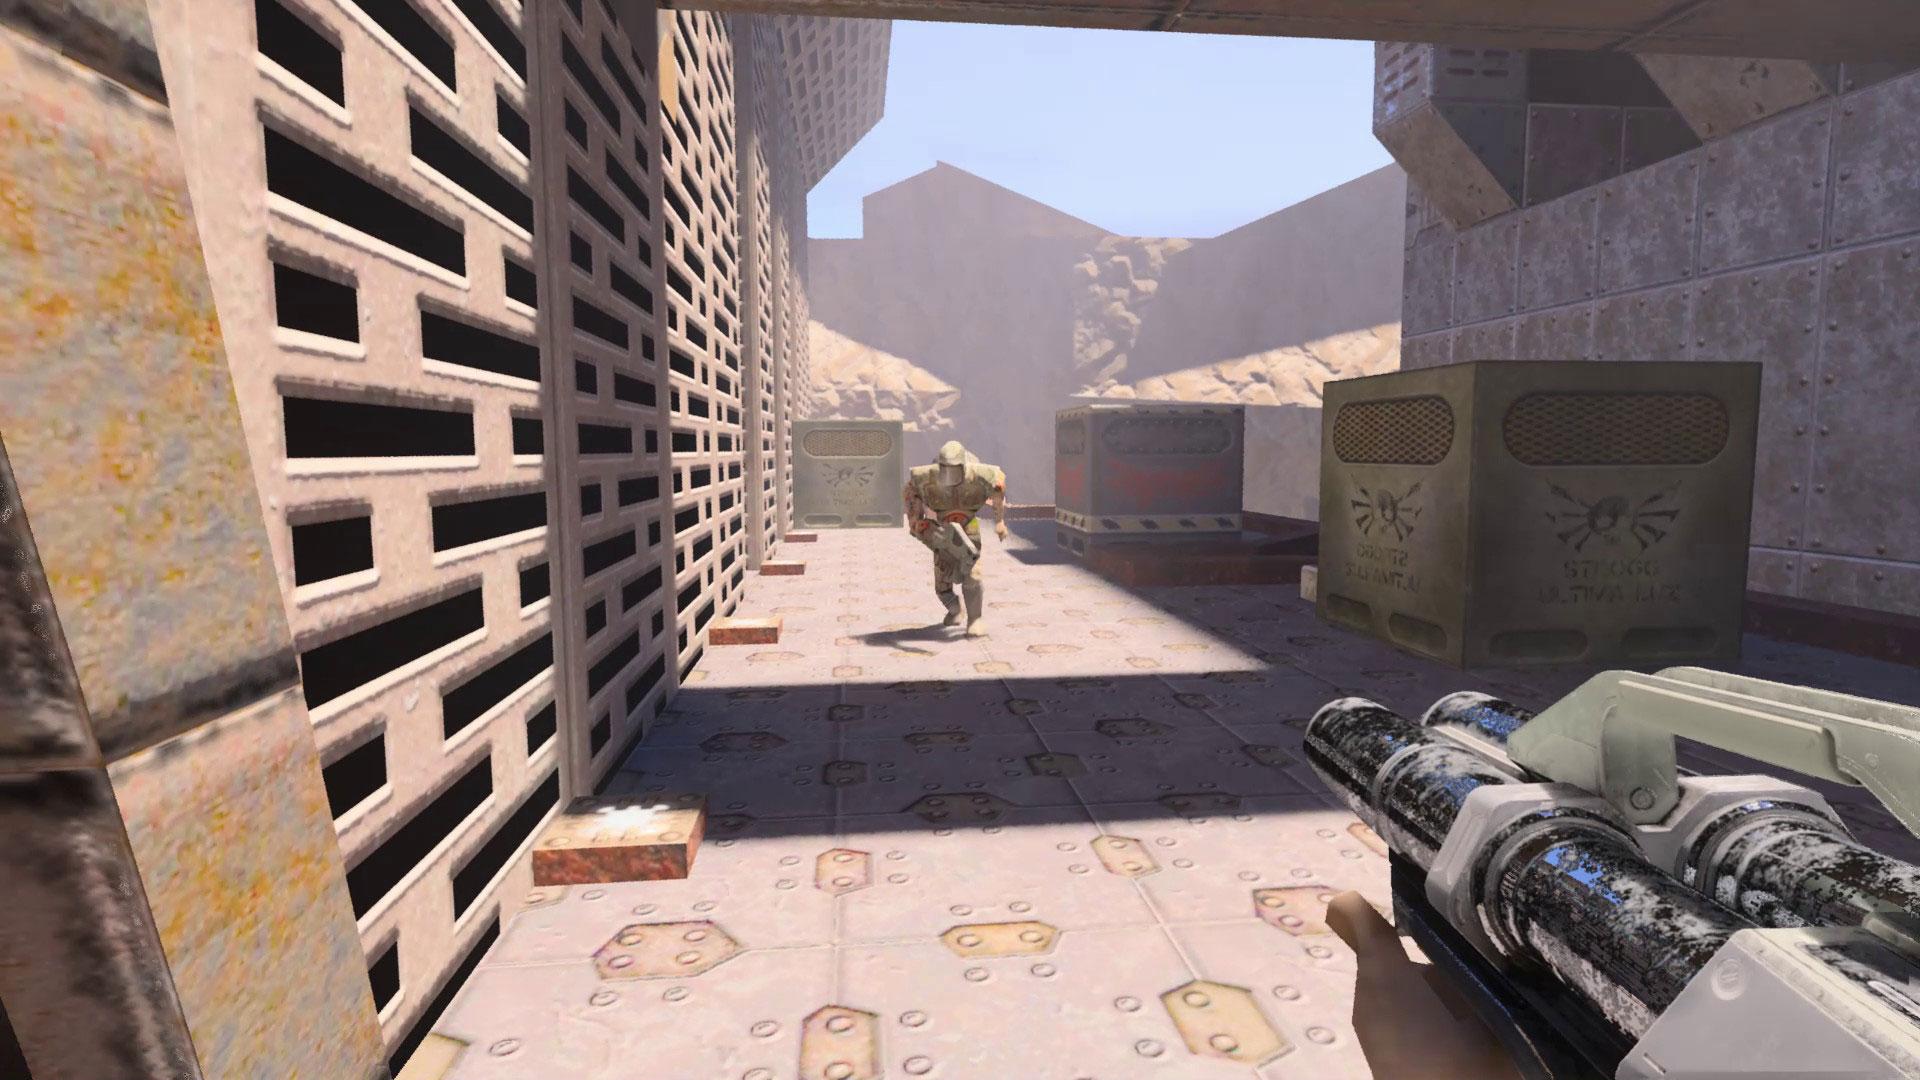 ⚡ Quake 3 download full game pc free | Quake 3 Free